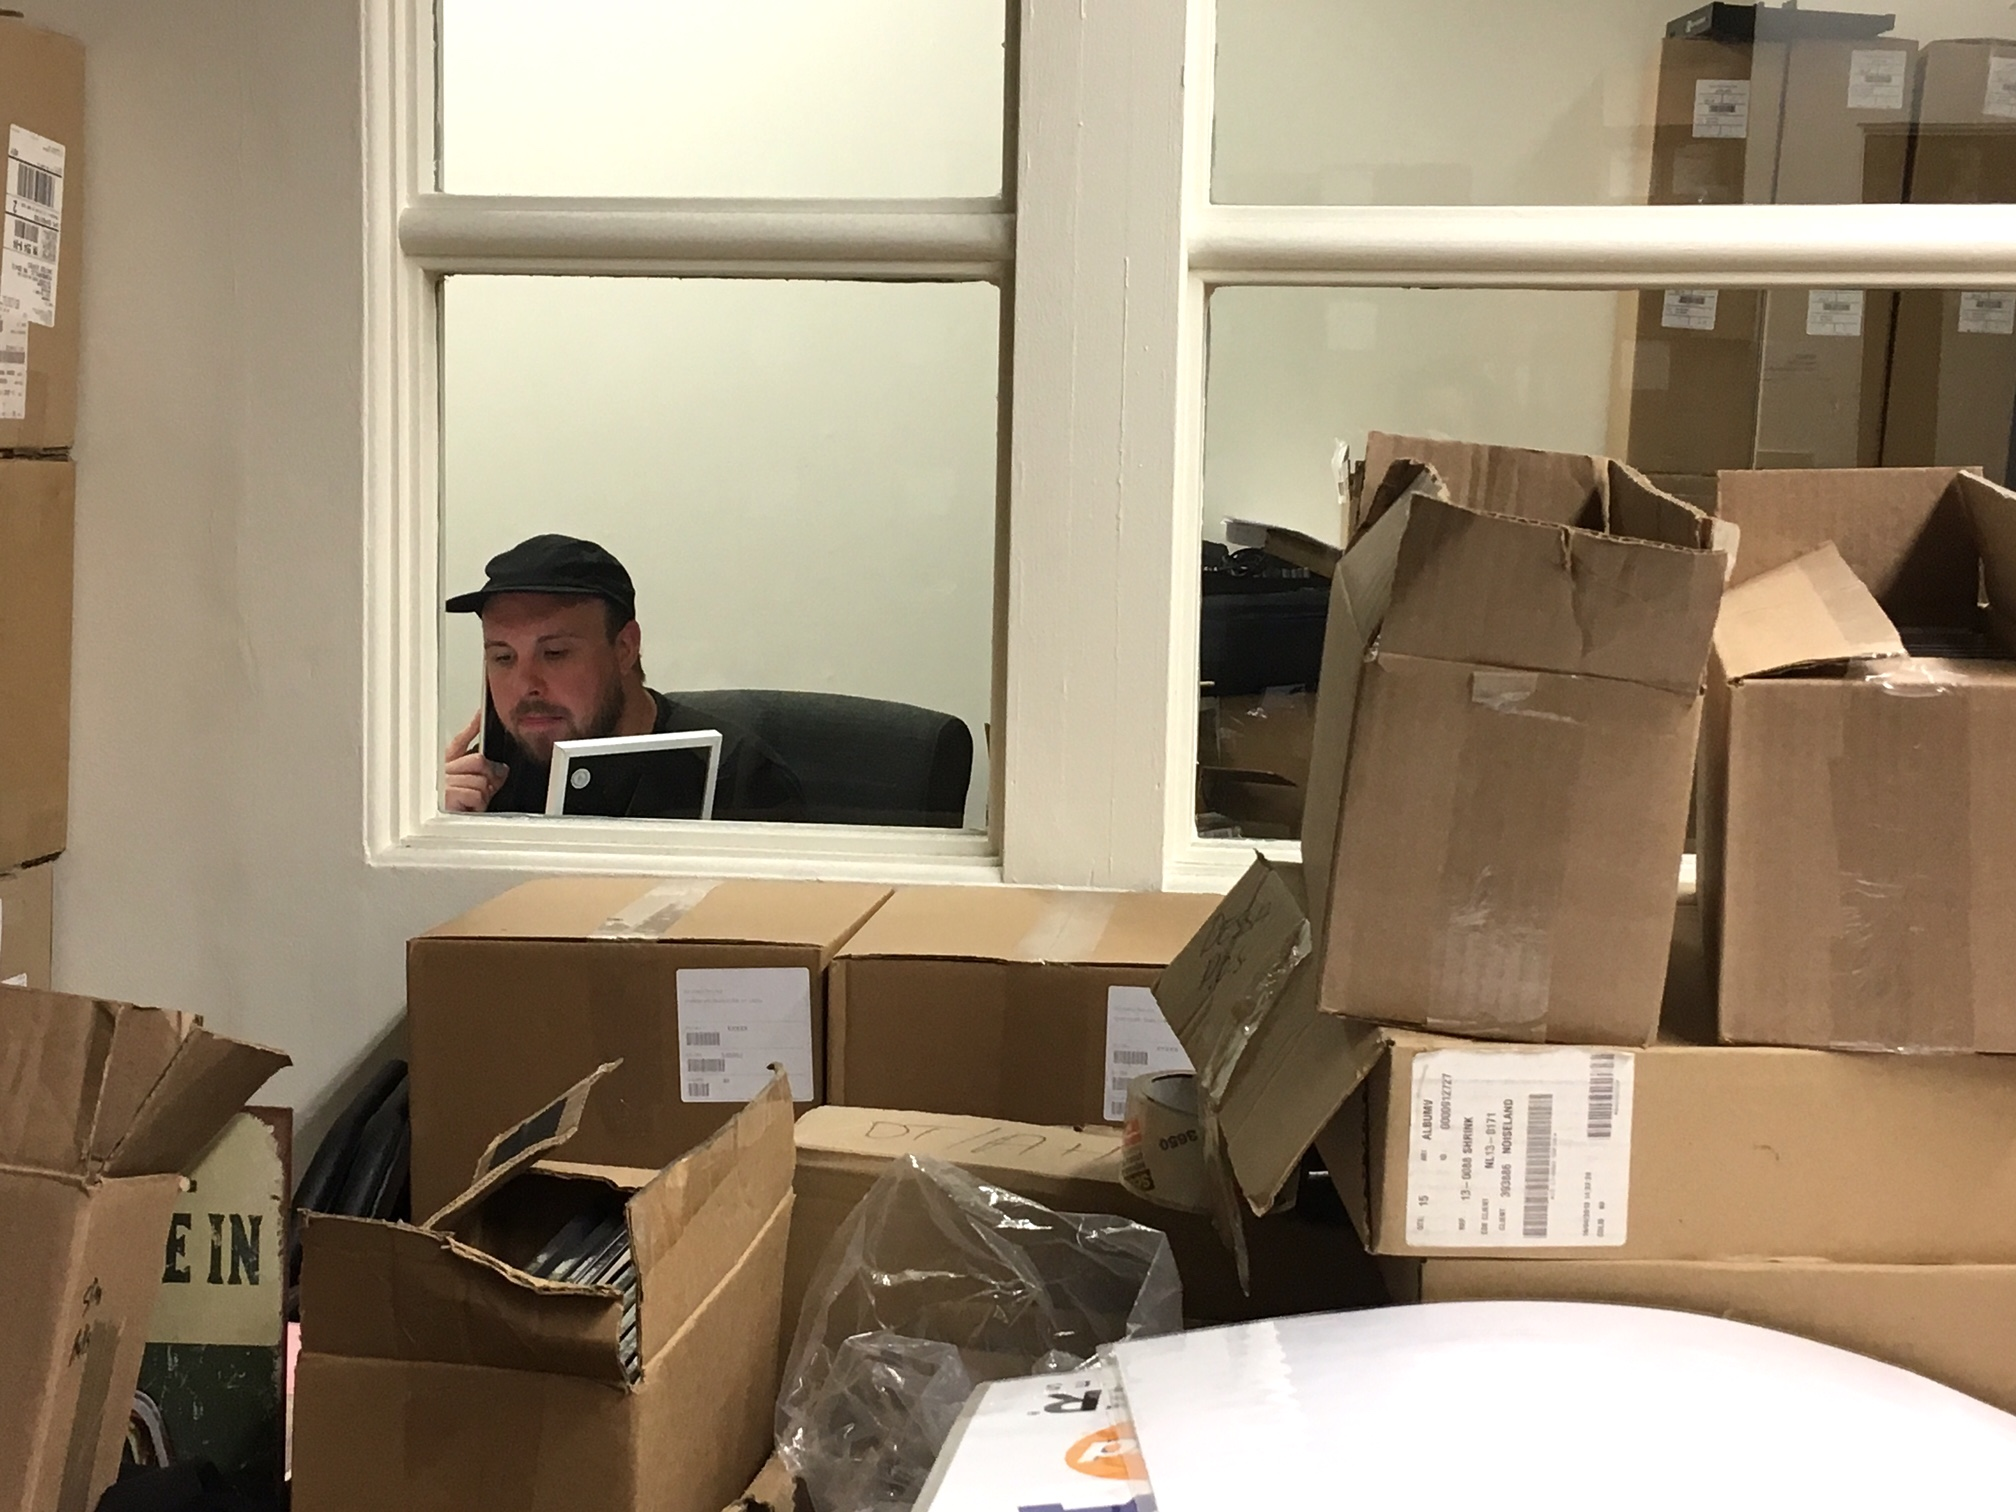 Caption: Lazerbeak, CEO of Doomtree Records, Credit: Nancy Rosenbaum